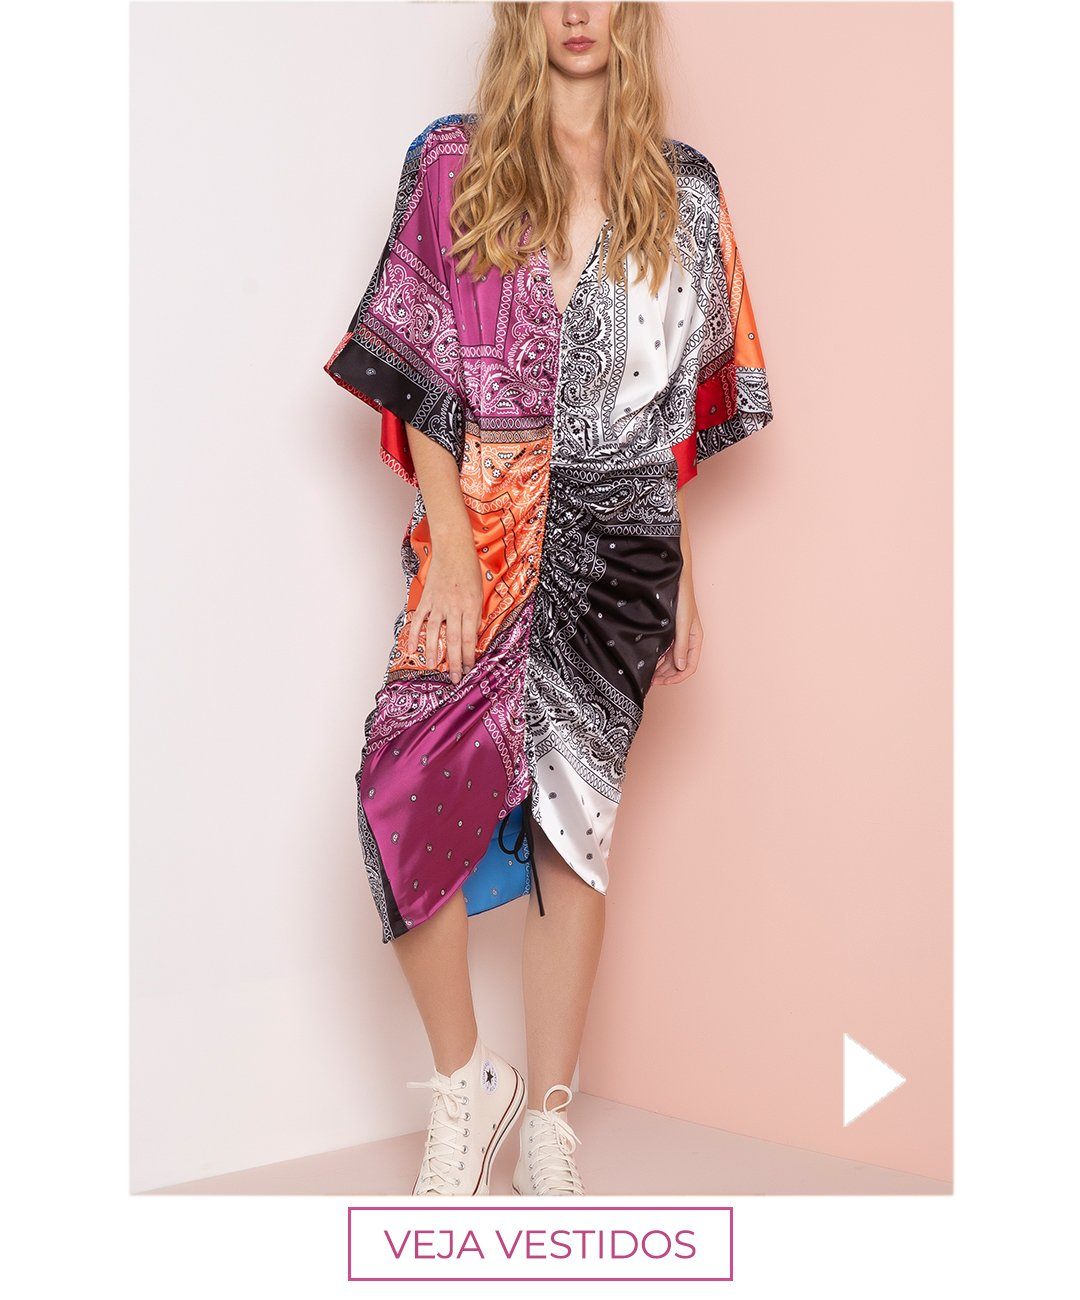 BANNER CARROSSEL vestidos MM